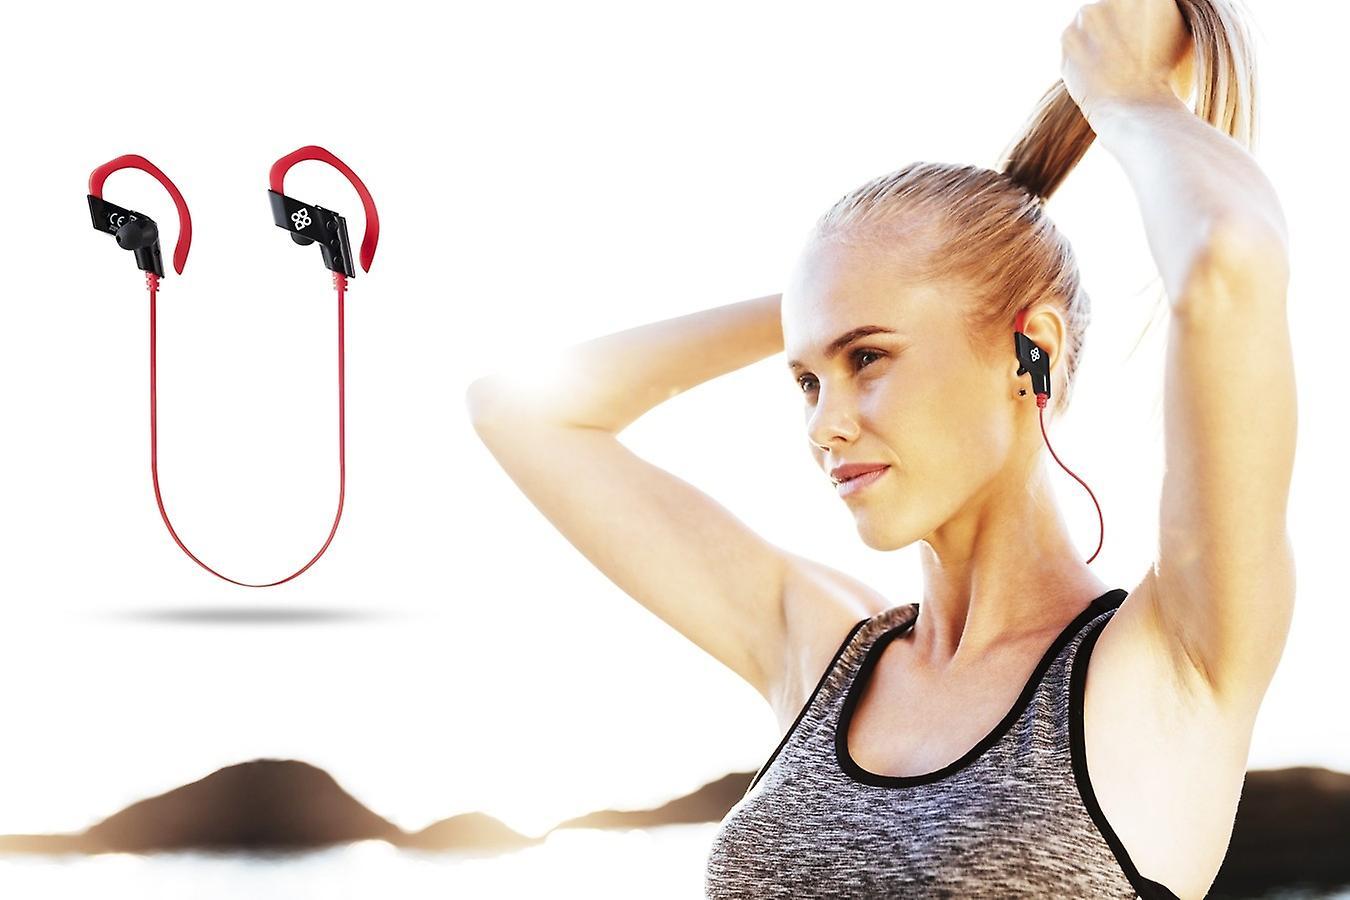 DUTCH ORIGINALS Bluetooth Headphones In Ear Wireless, In ear Headphone Sport with Microphone and Handle, Earphones wireless for Phone Iphone Samsung, Black